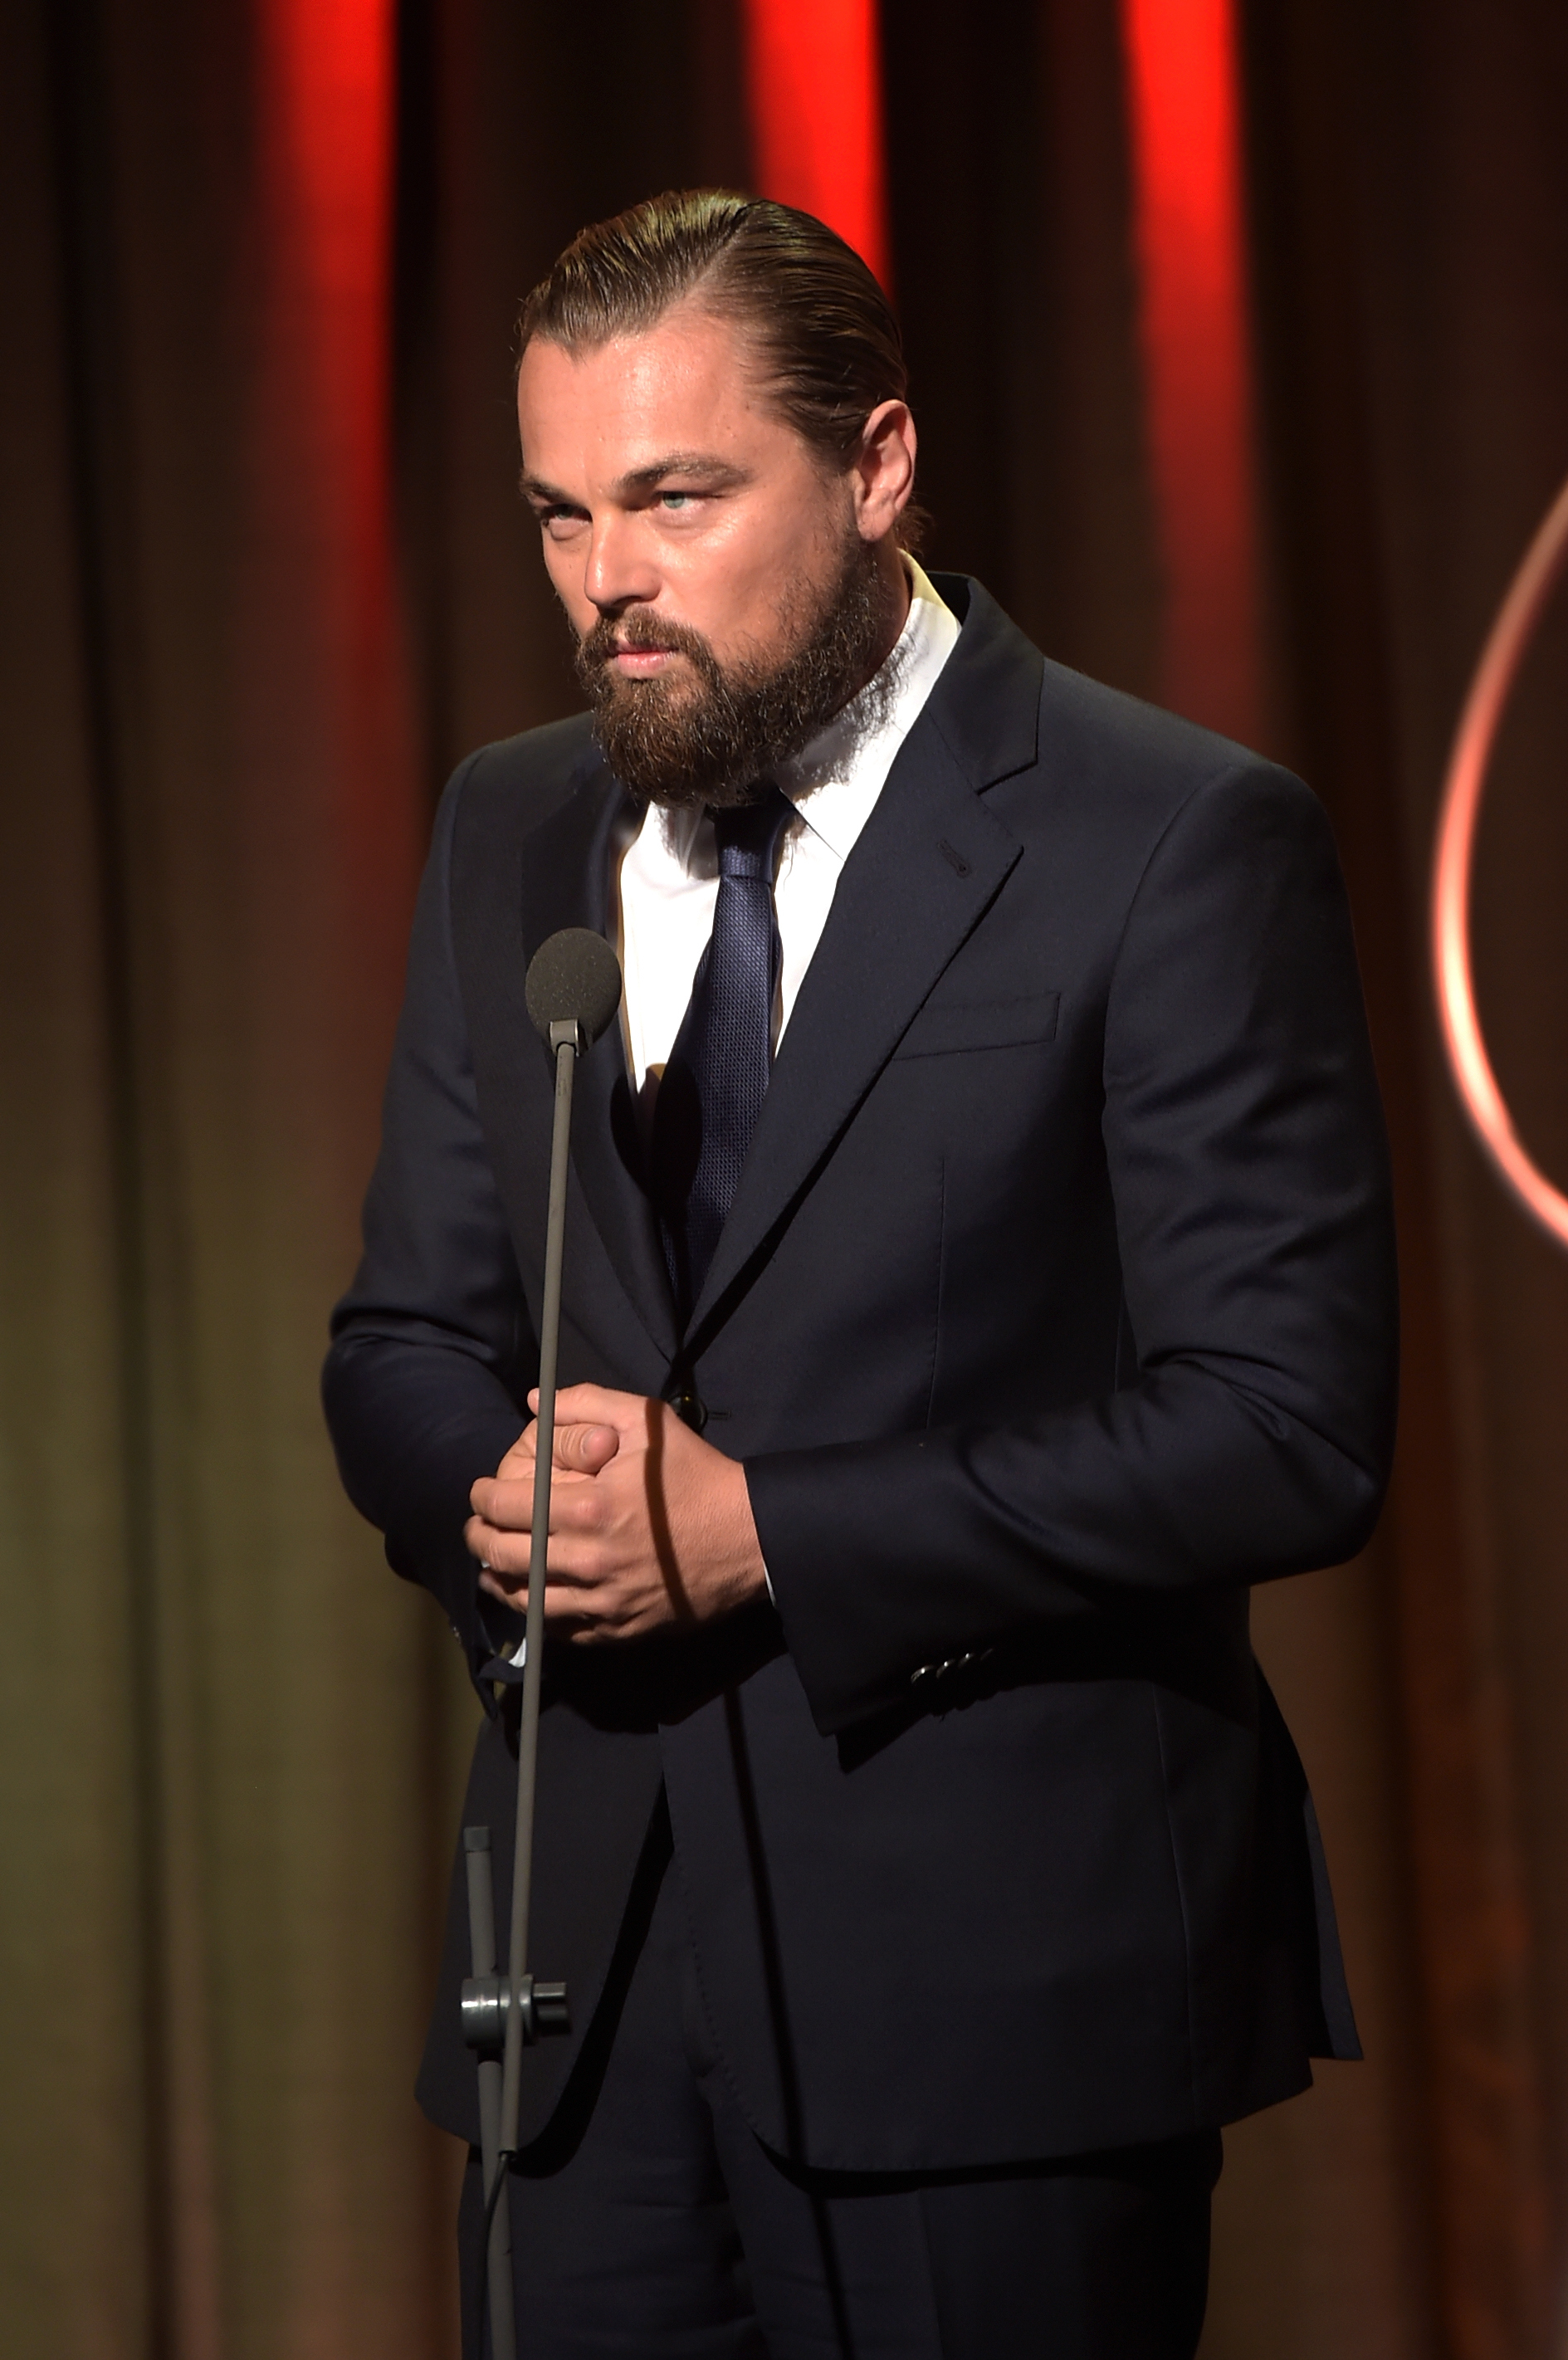 Leonardo DiCaprio will play the serial killer in the new movie Scorsese